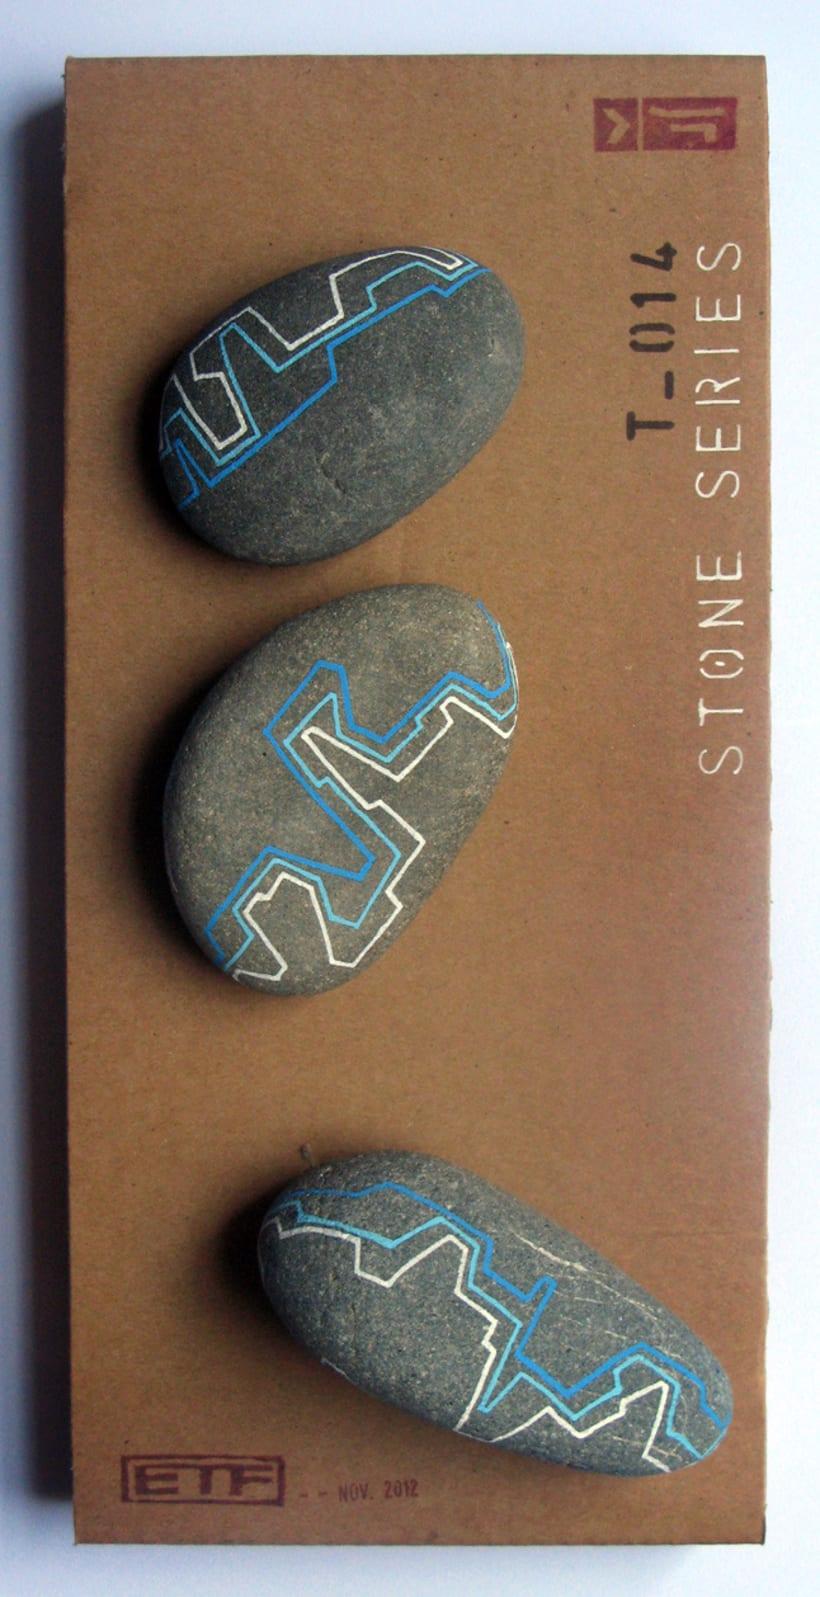 ETF: Menorca Stone Series_2013 1